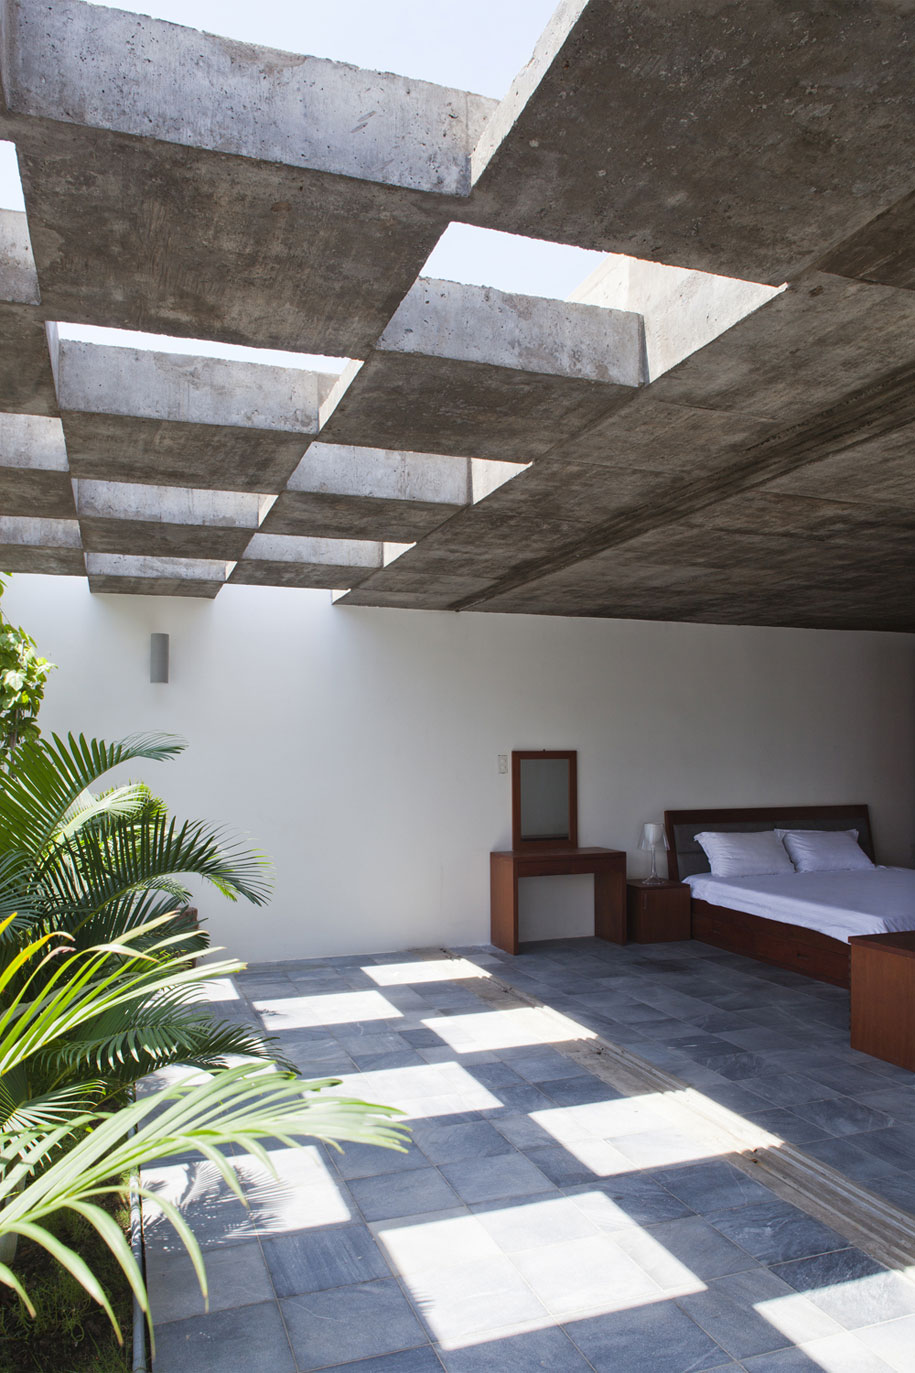 52156a65e8e44e9a45000061_binh-thanh-house-vo-trong-nghia-architects-sanuki-nishizawa-architects_pic14-5f-bedroom